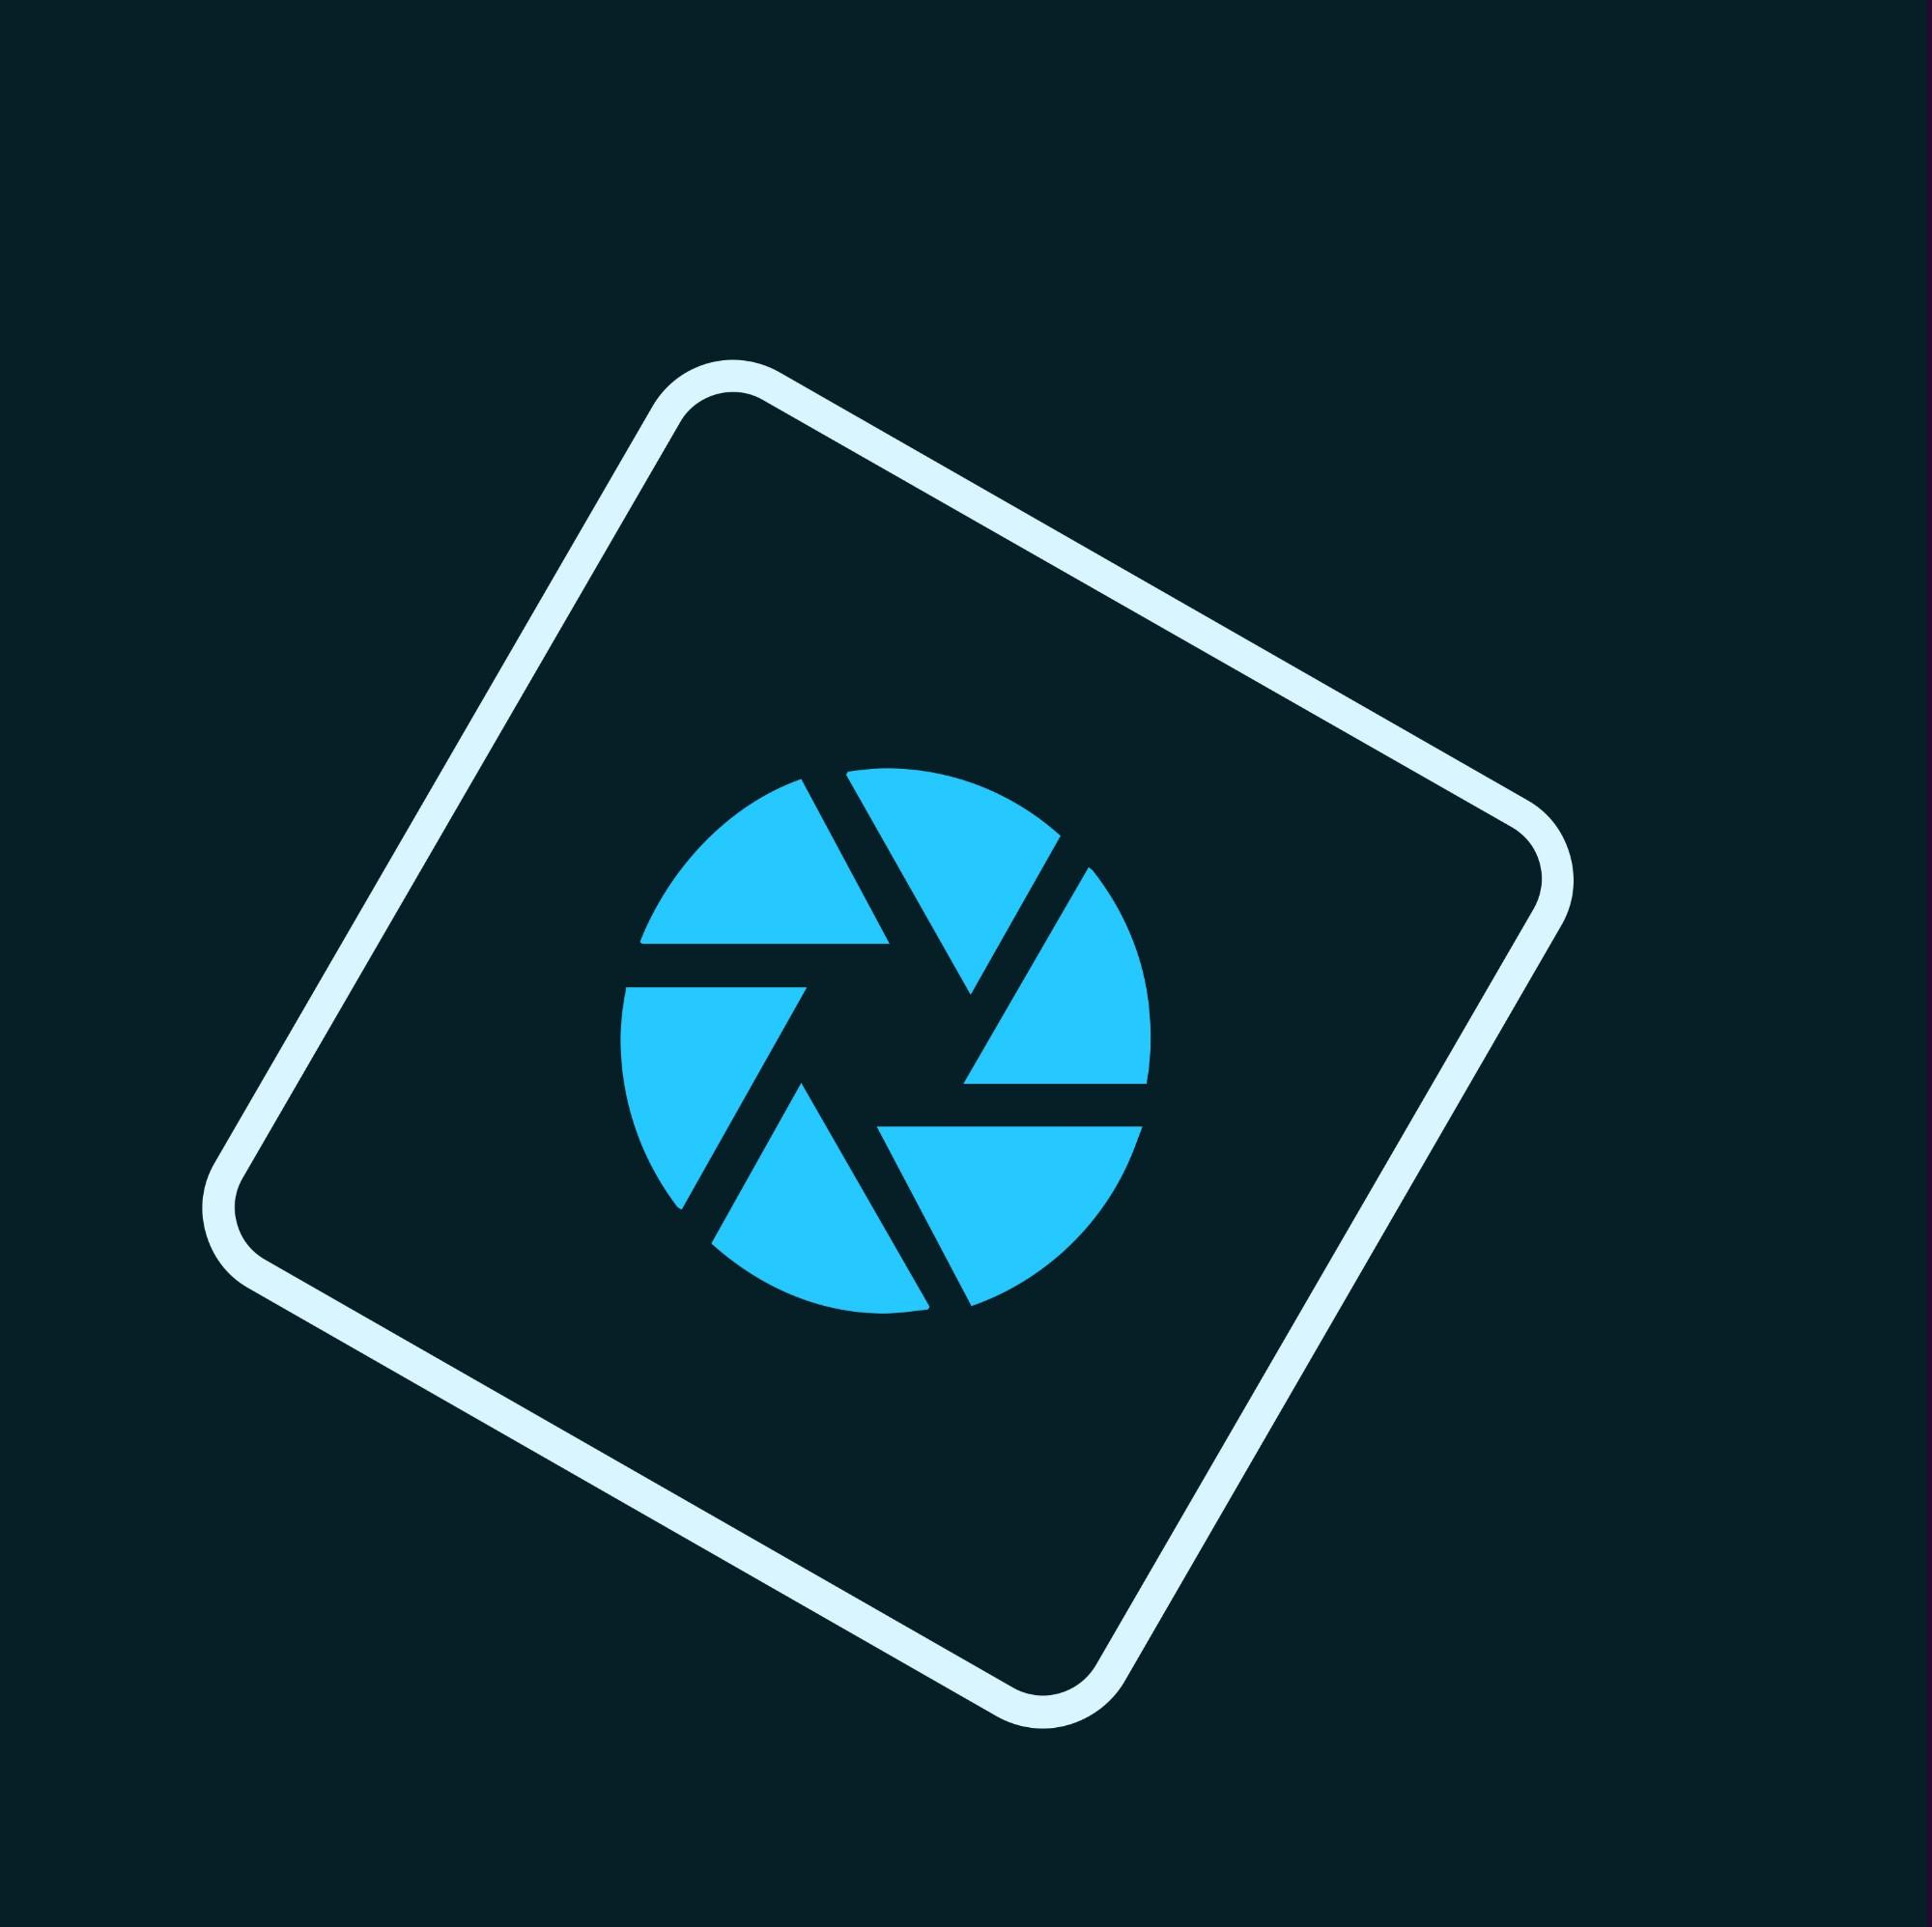 Adobe Photoshop Elements 2021 Windows 1 license(s)